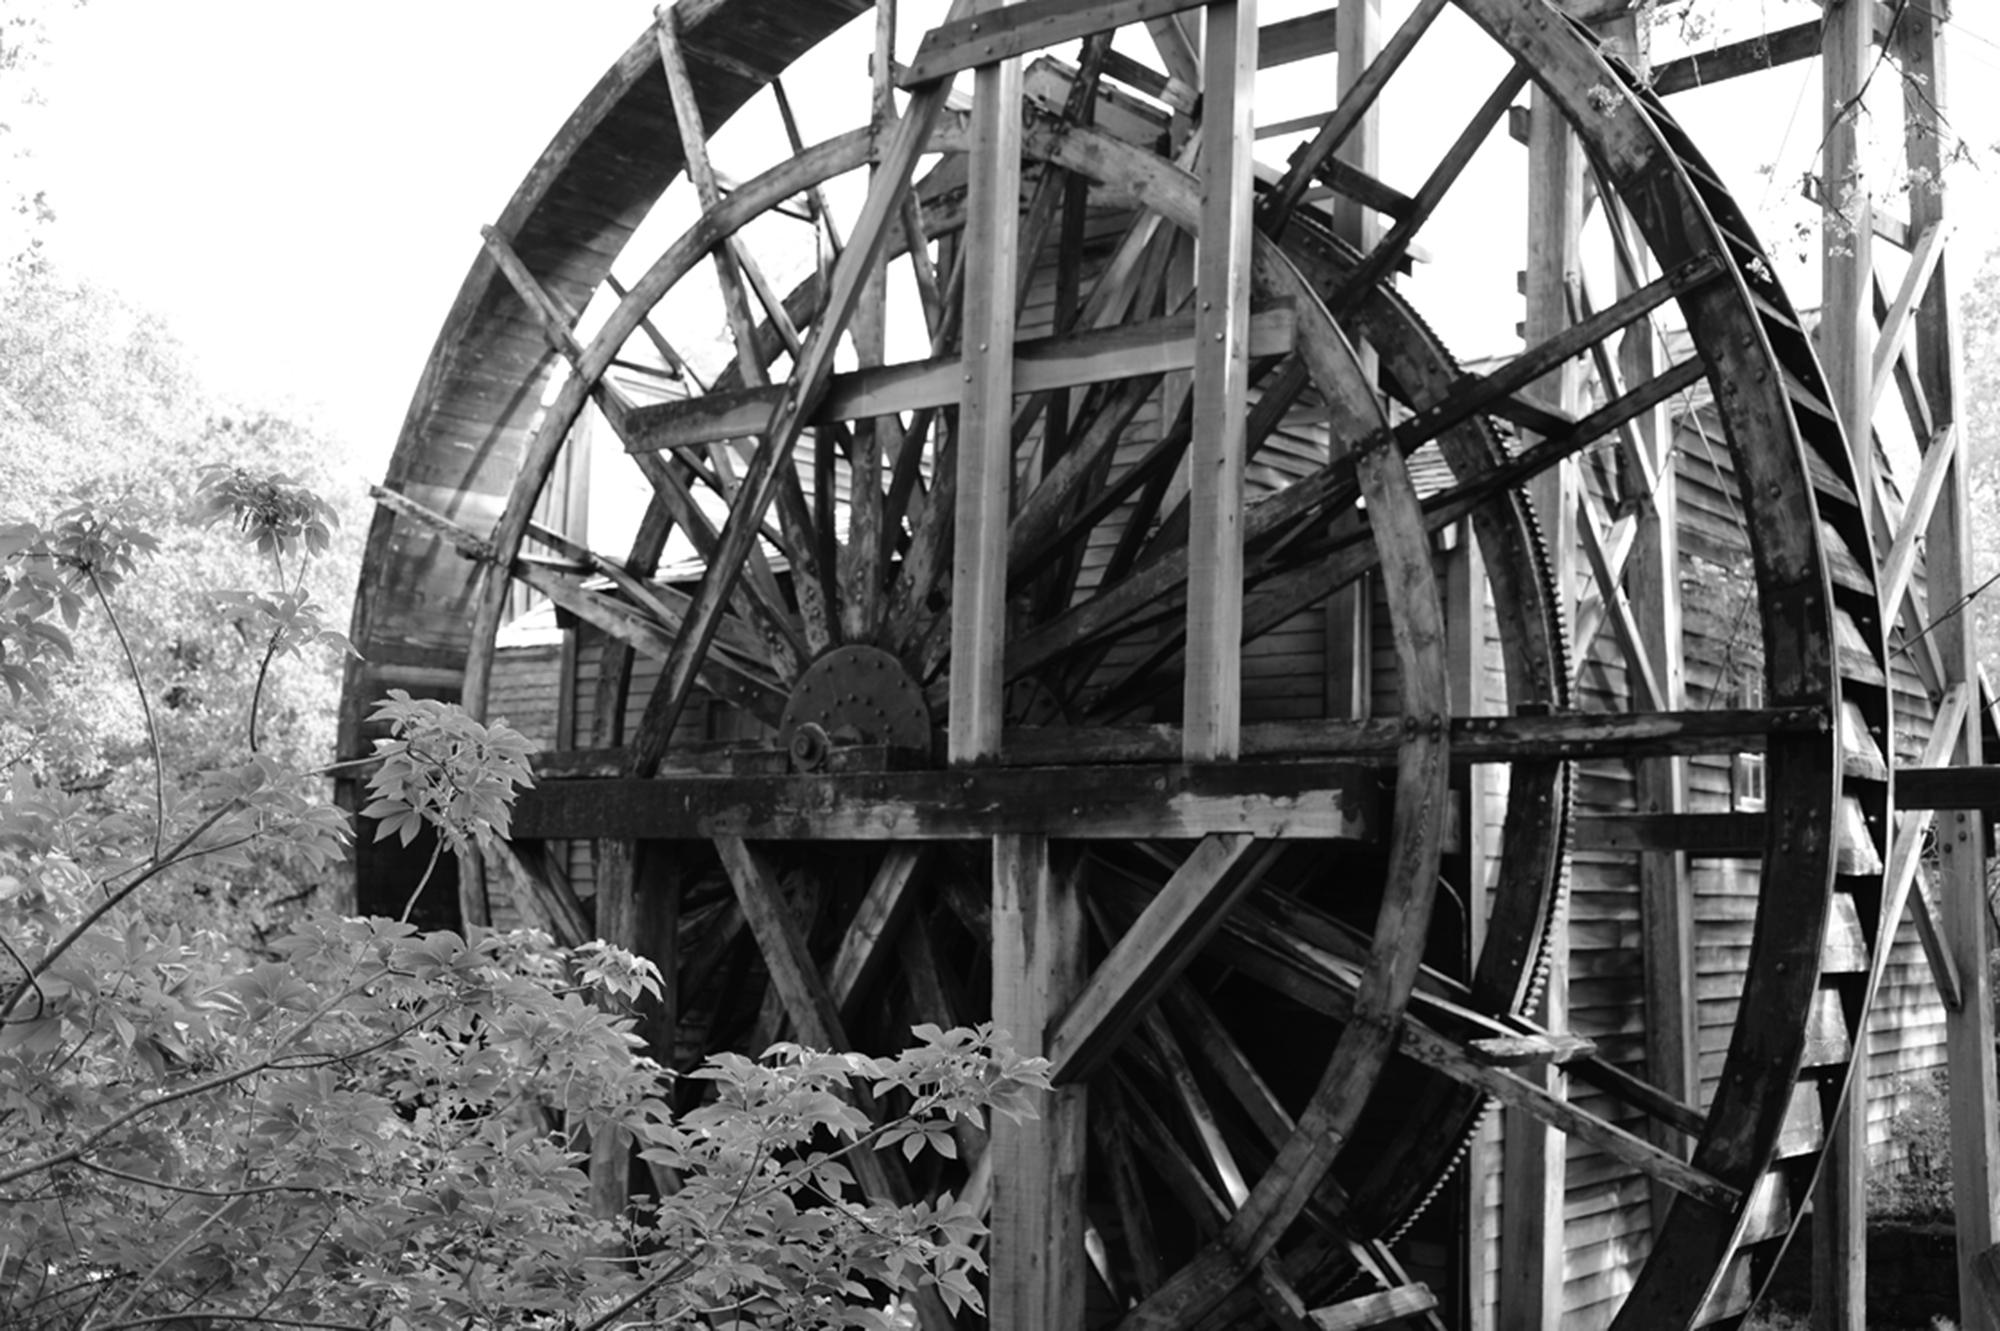 Old Mill 3 by Rich J. Velasco